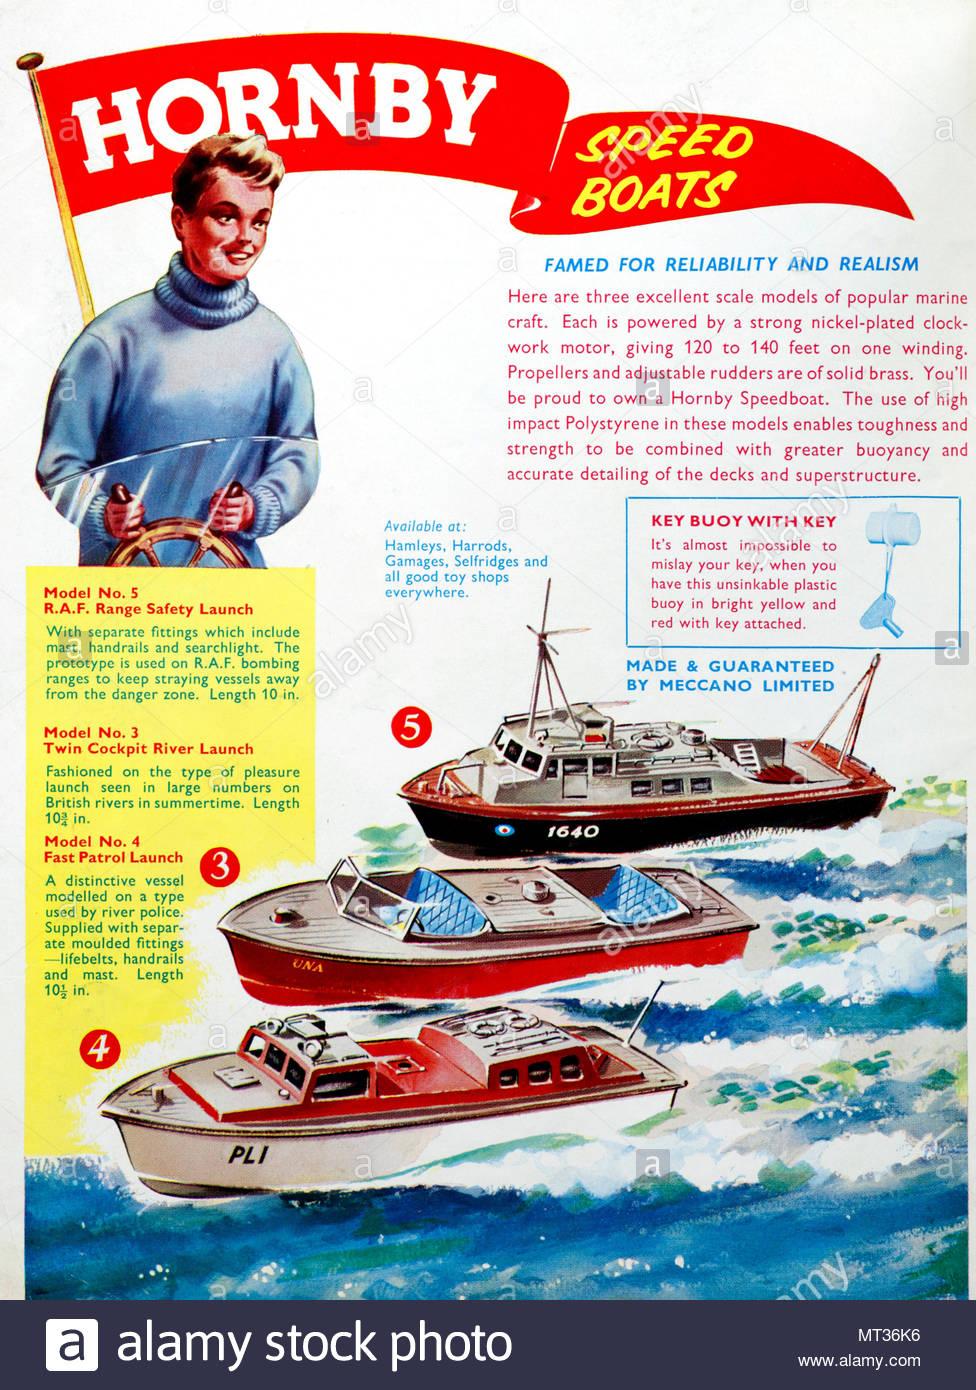 Hornby vintage advertising 1963 - Stock Image